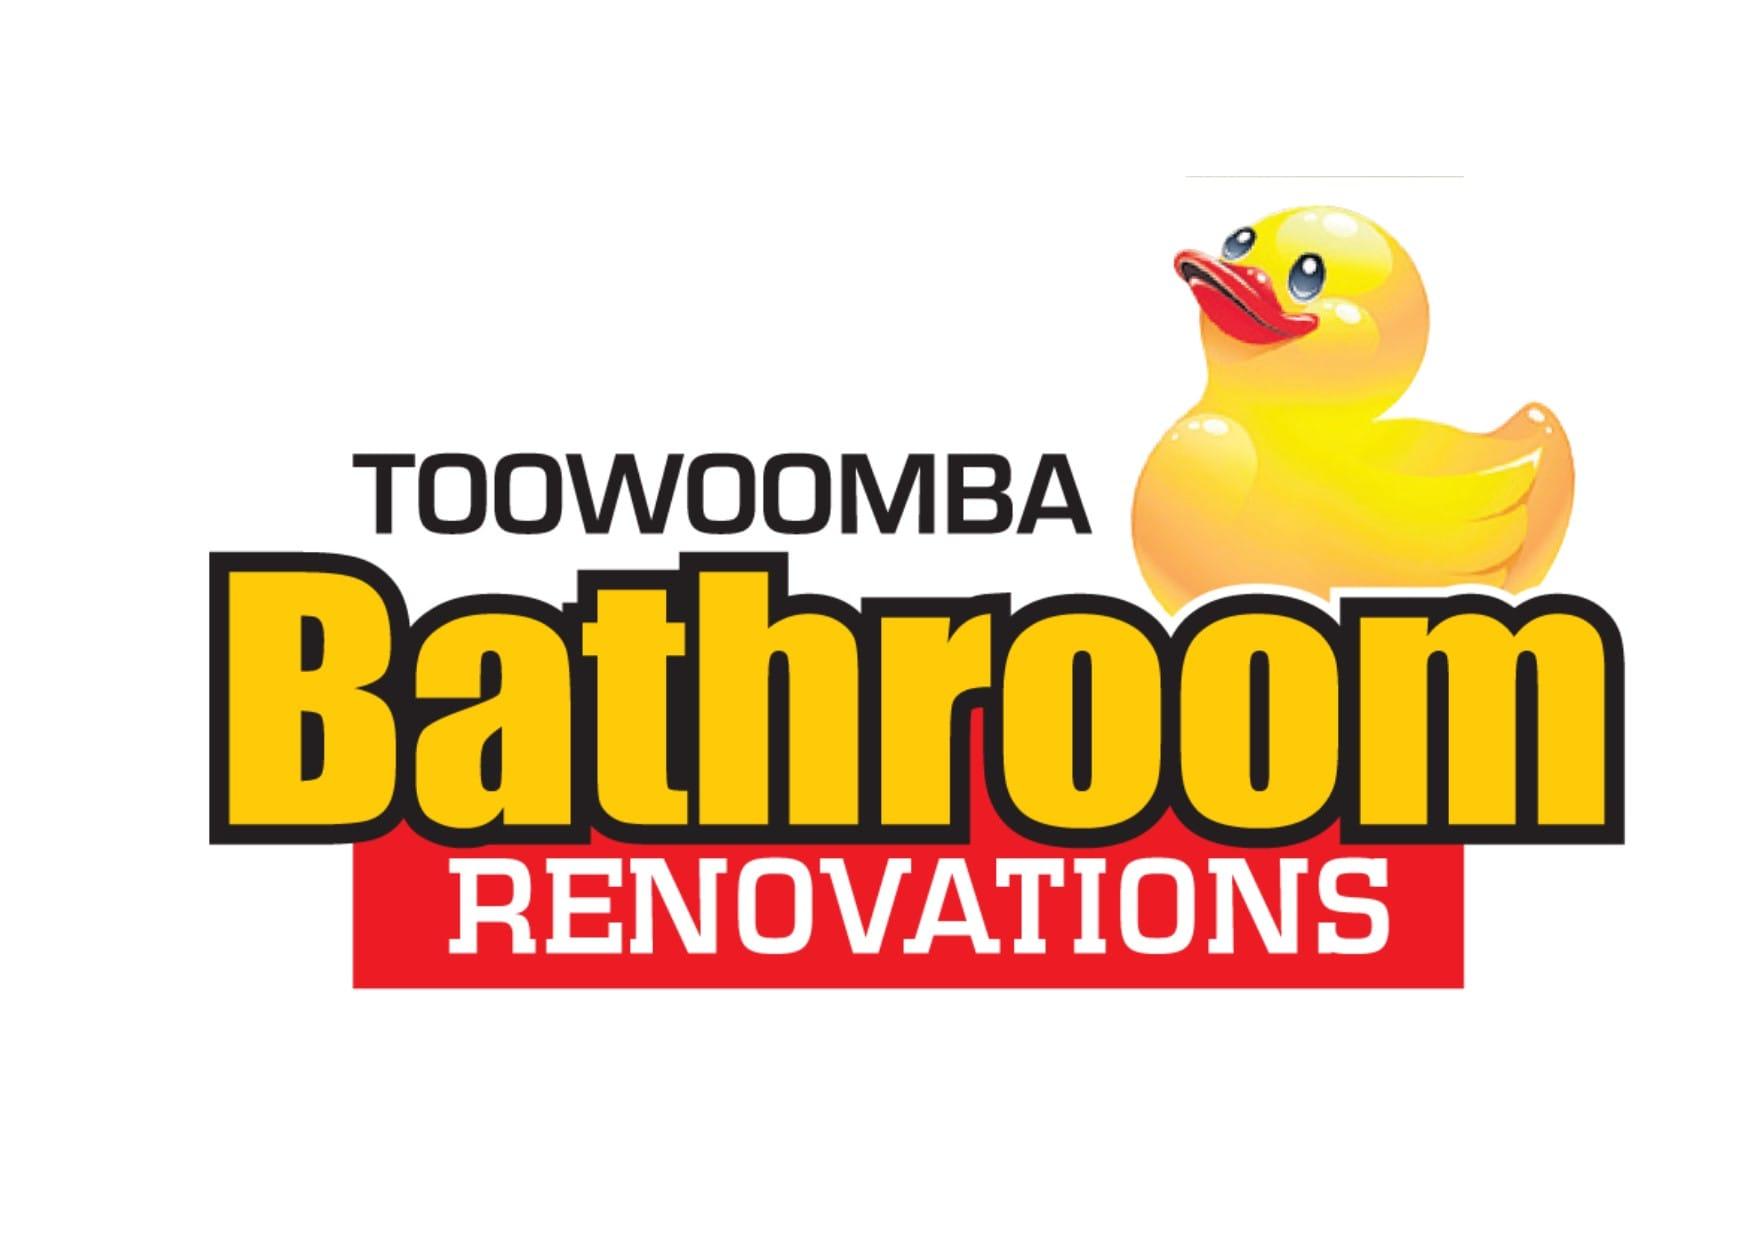 Bathroom Renovations Qld bathroom renovations & designs in toowoomba region, qld